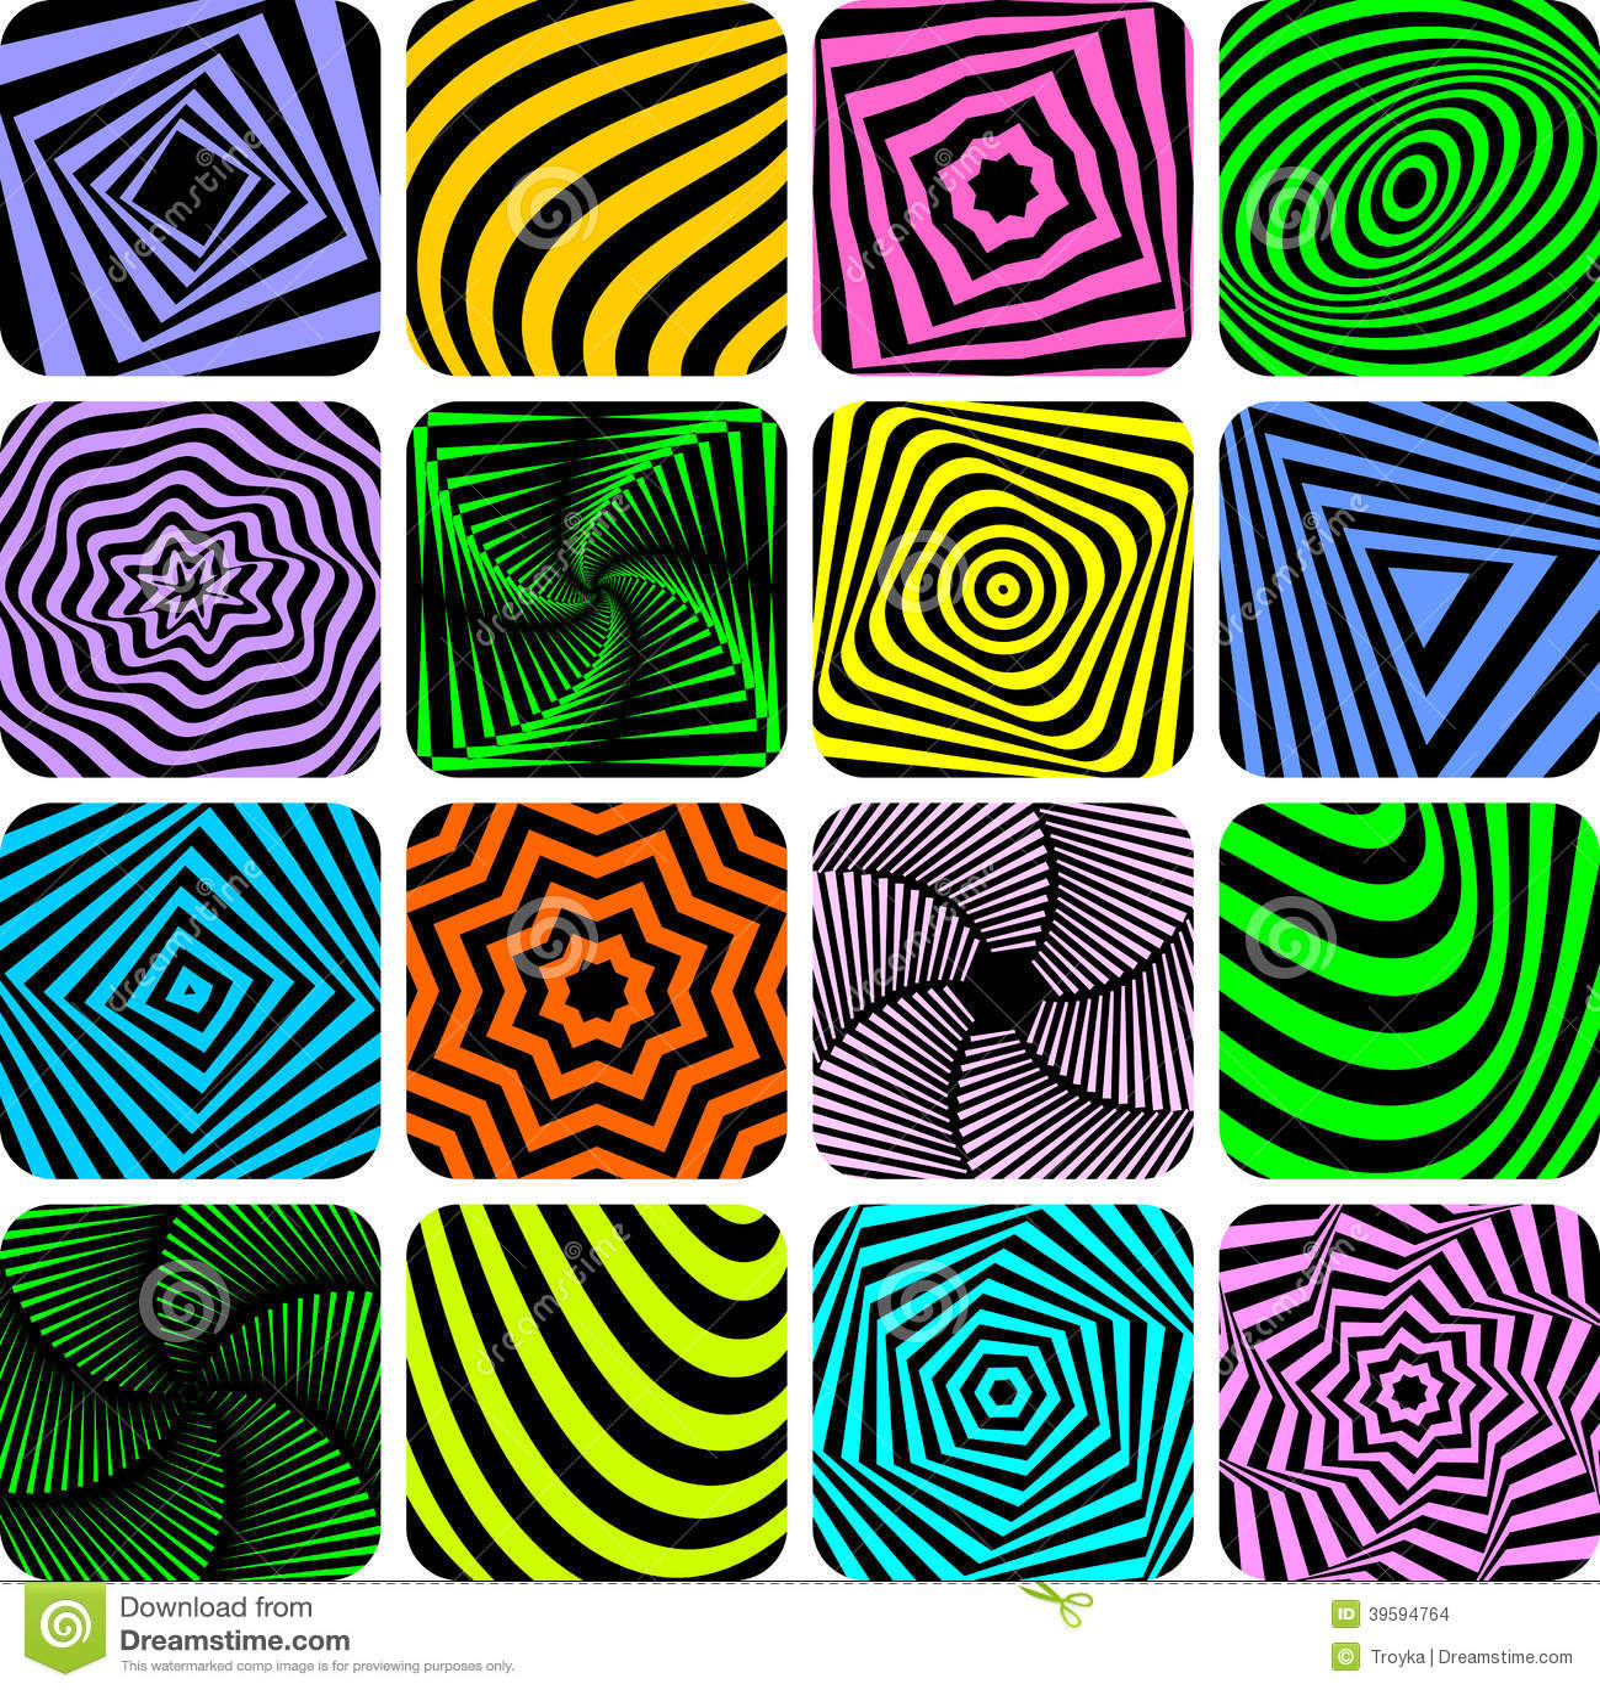 Elements Of Design In Art : Patterns set design elements stock vector image